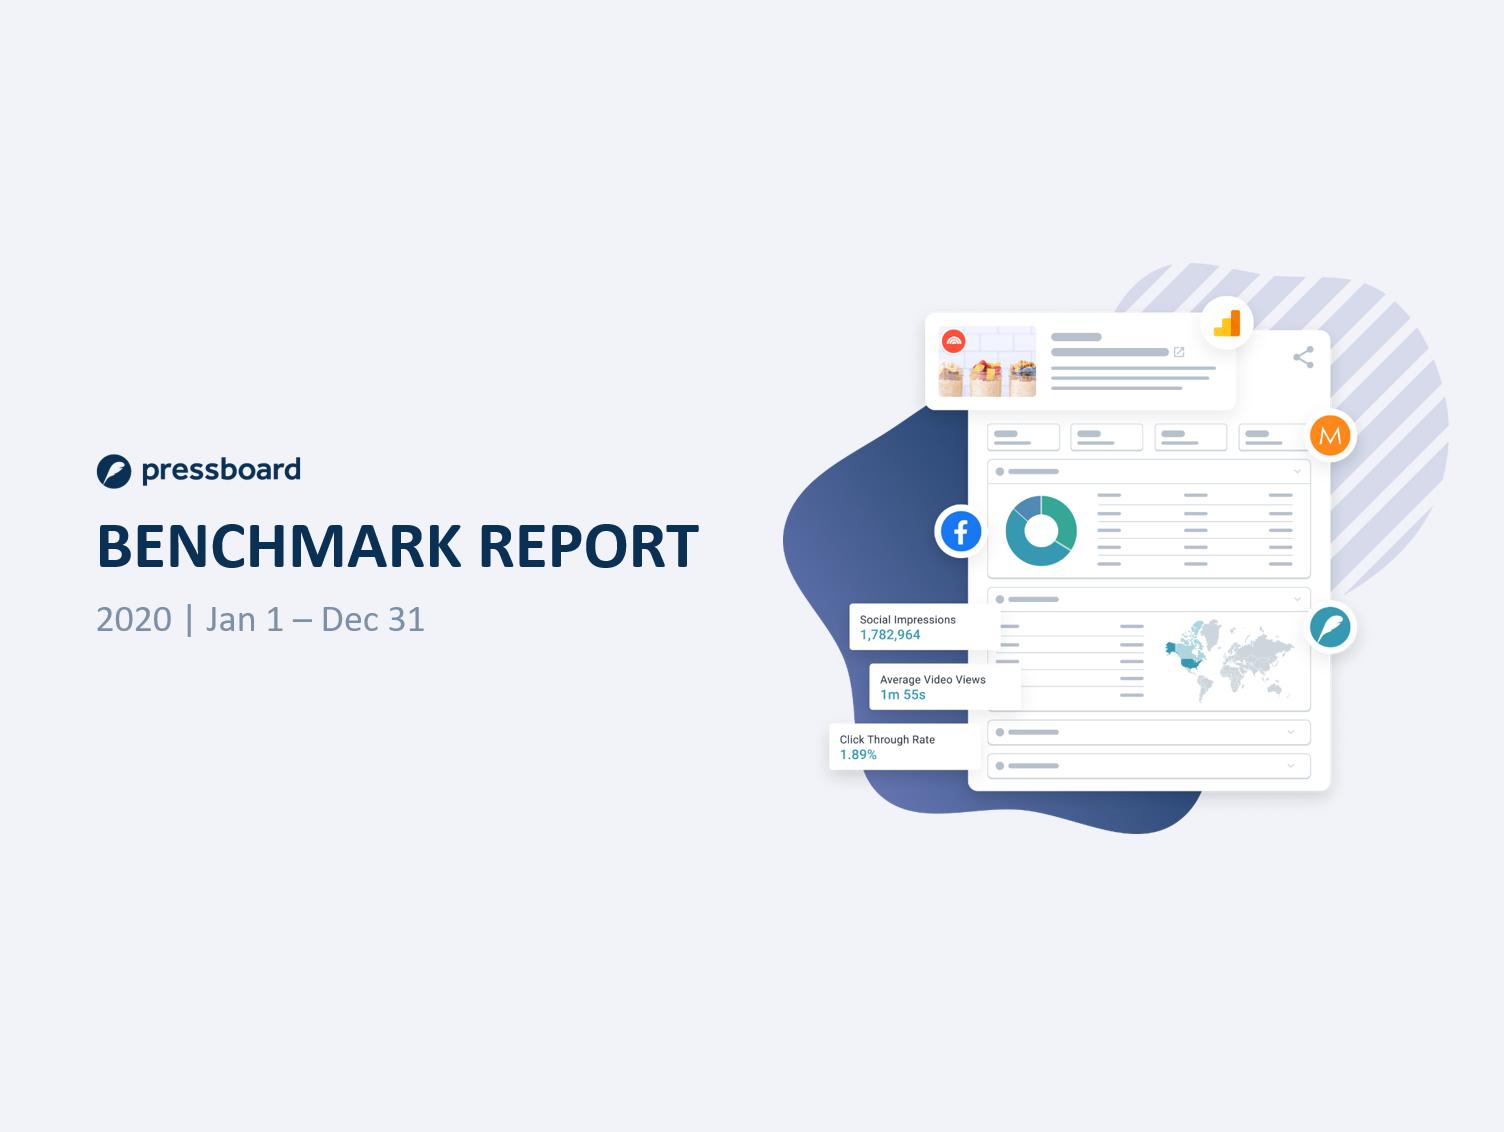 Pressboard Branded Content Benchmarks Report 2020